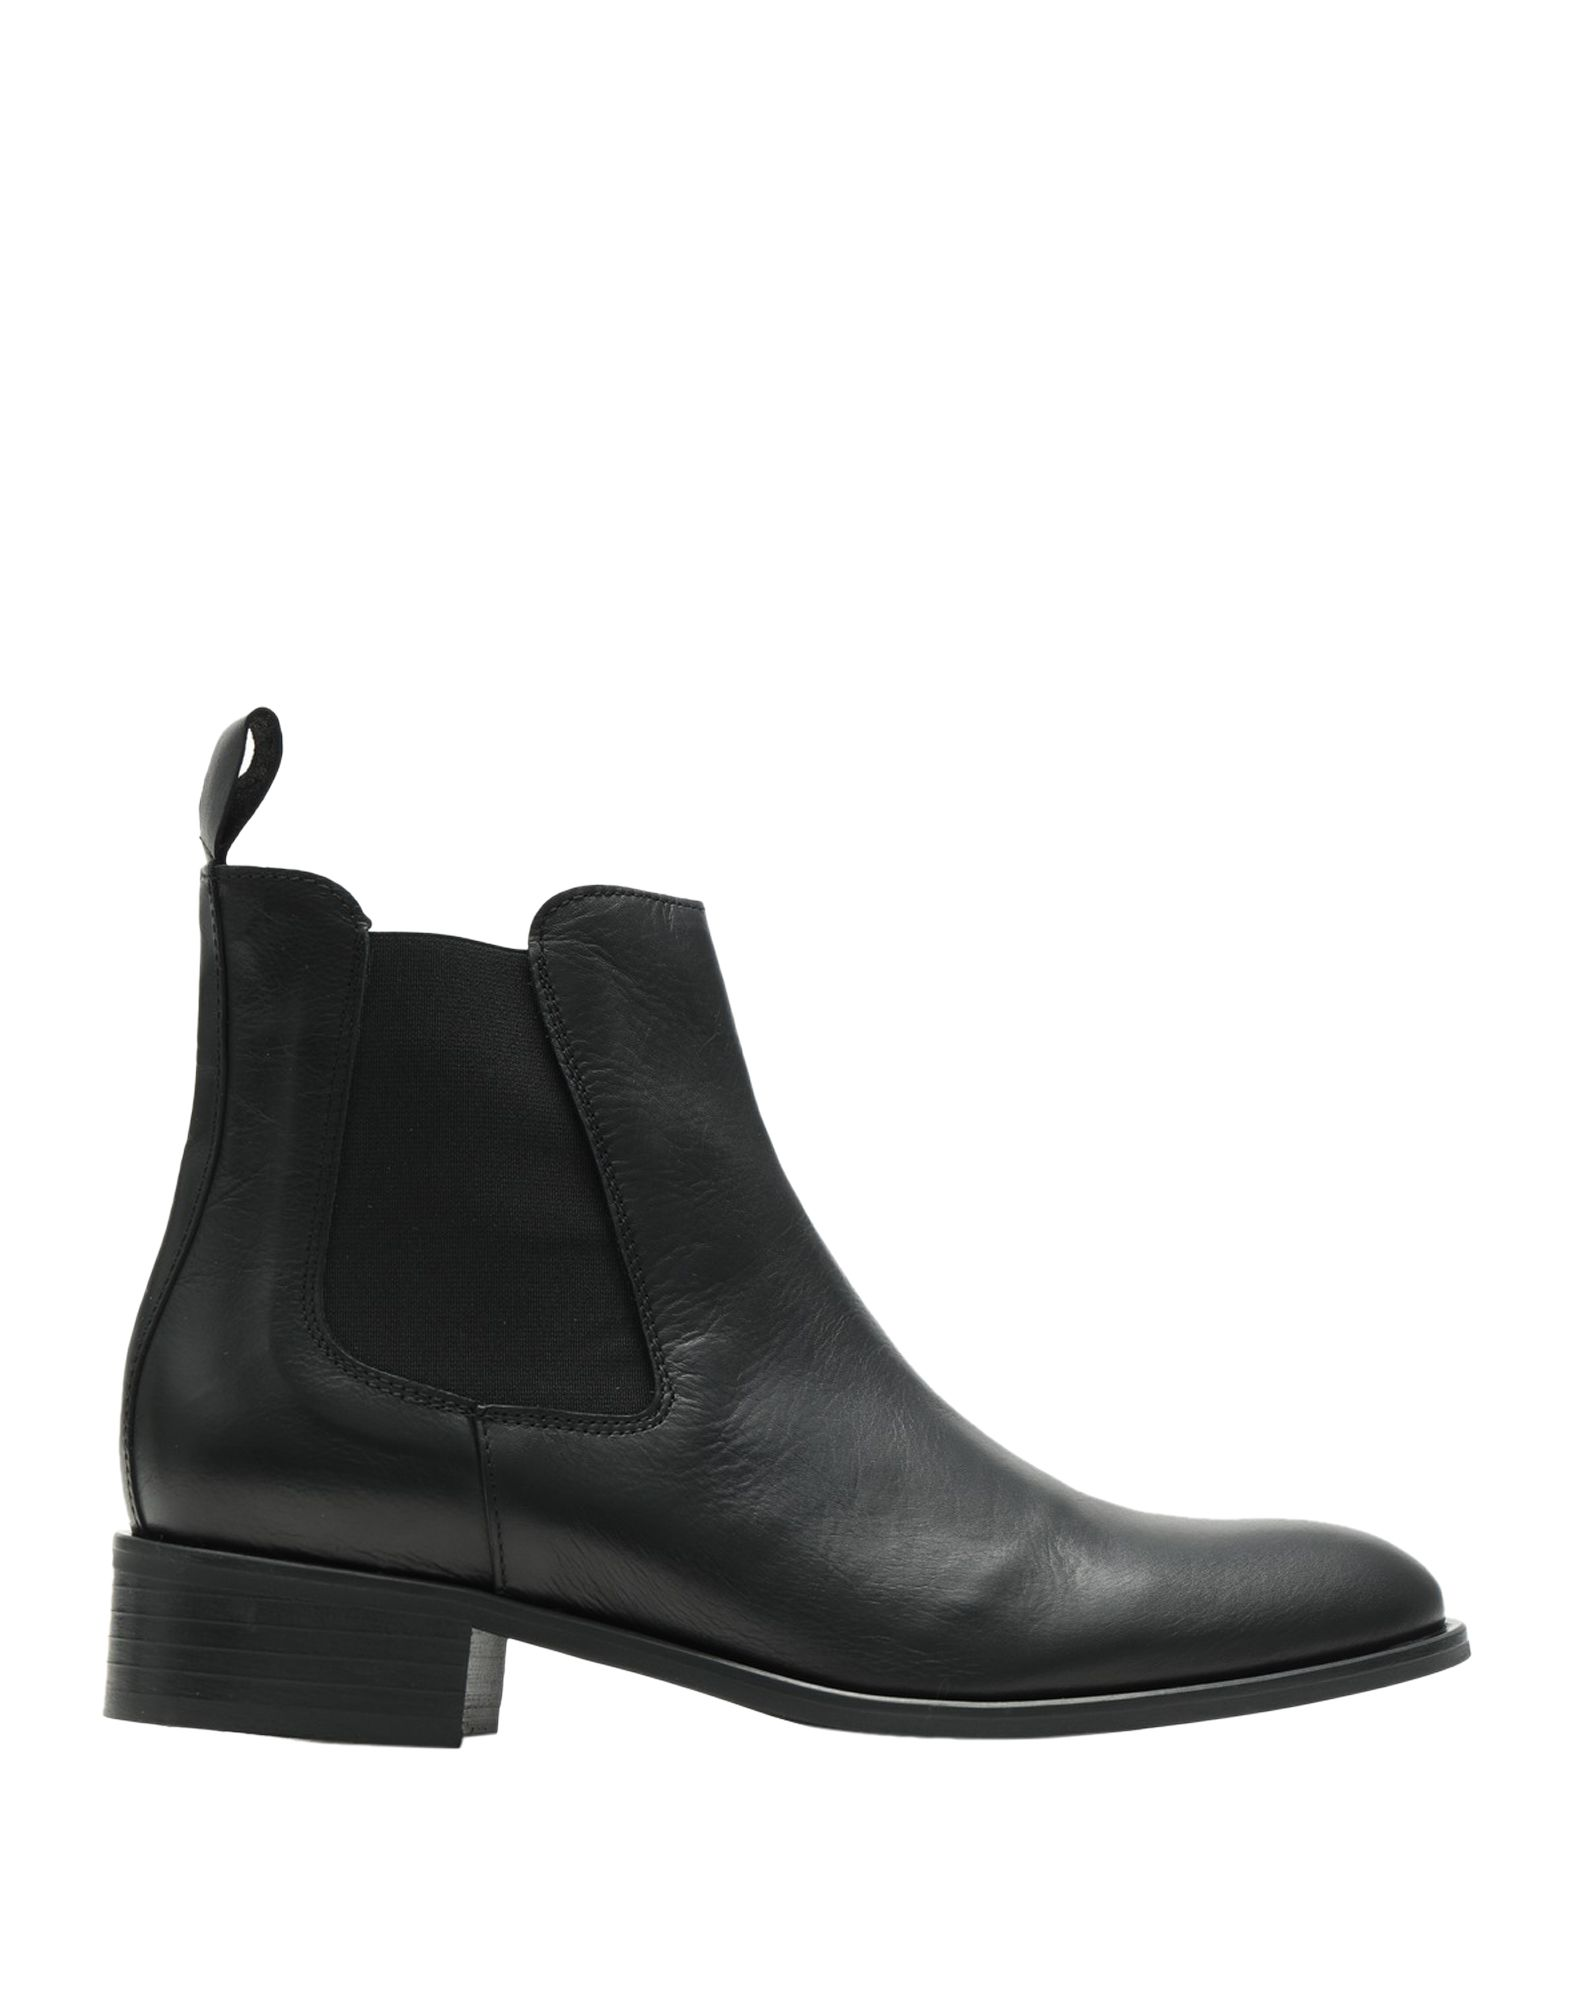 Stilvolle billige Schuhe Damen Leonardo Principi Chelsea Boots Damen Schuhe  11514406GG 92cdd0